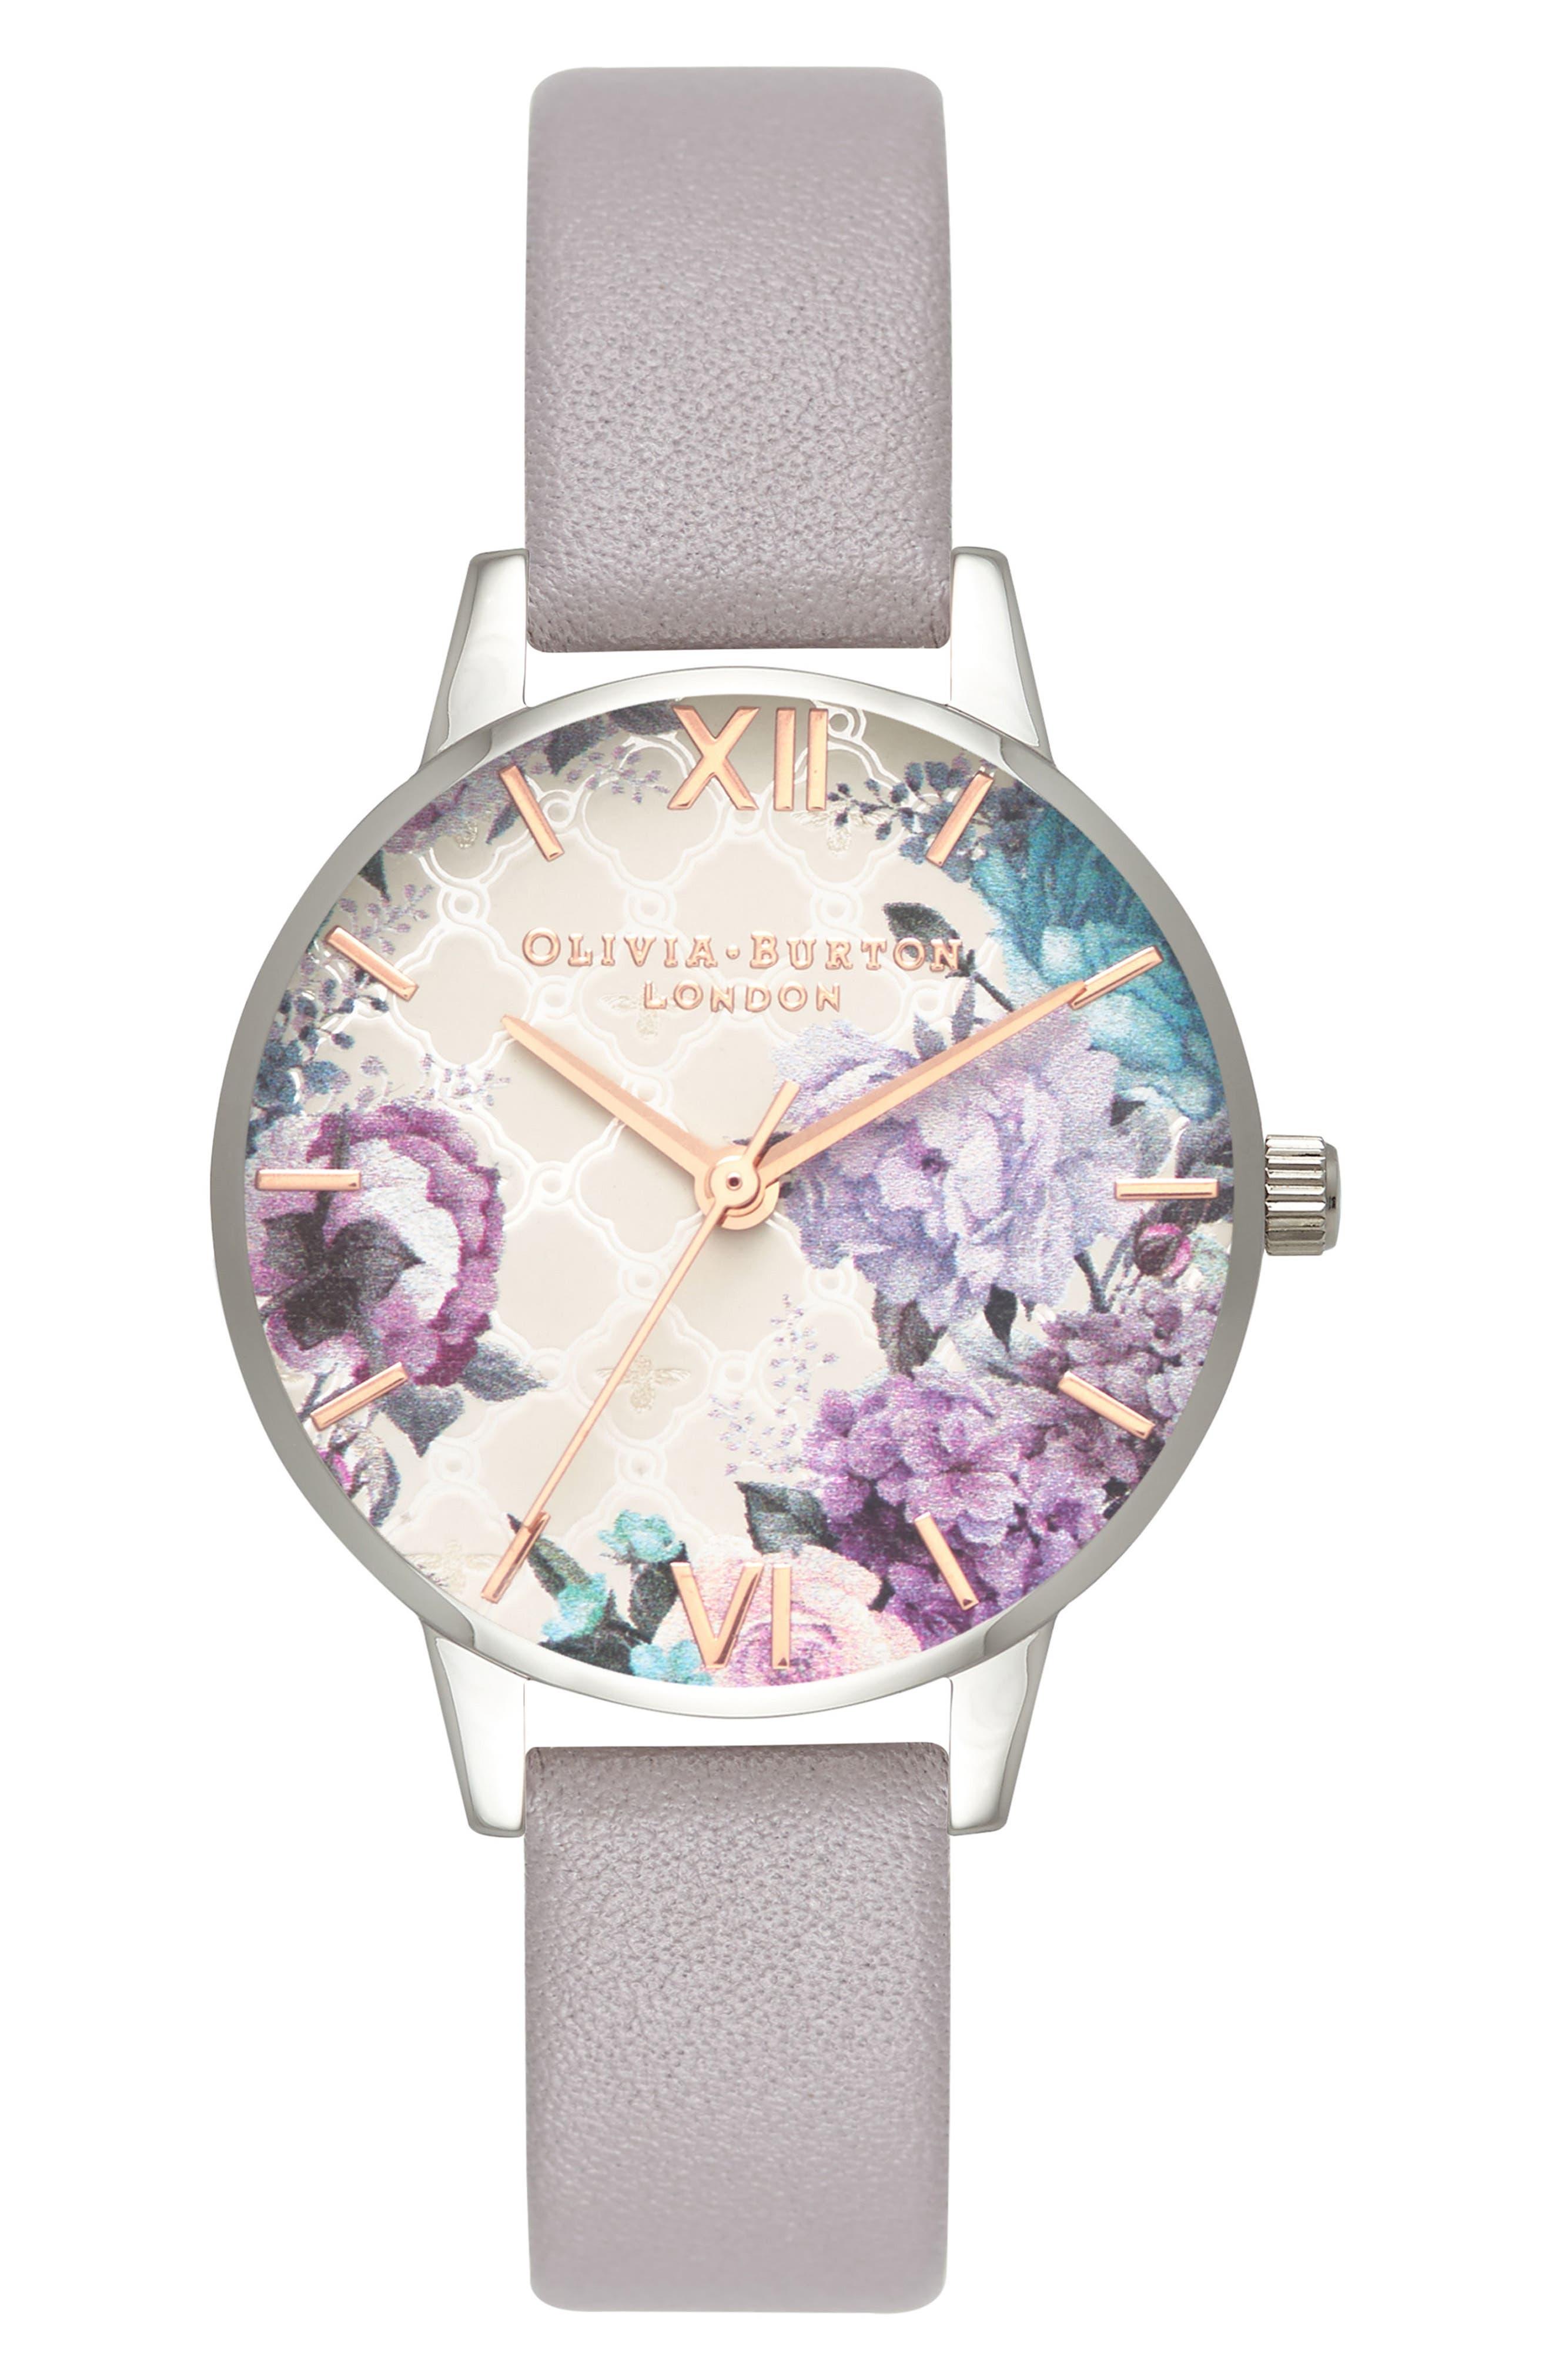 OLIVIA BURTON, Glasshouse Leather Strap Watch, 30mm, Main thumbnail 1, color, 028